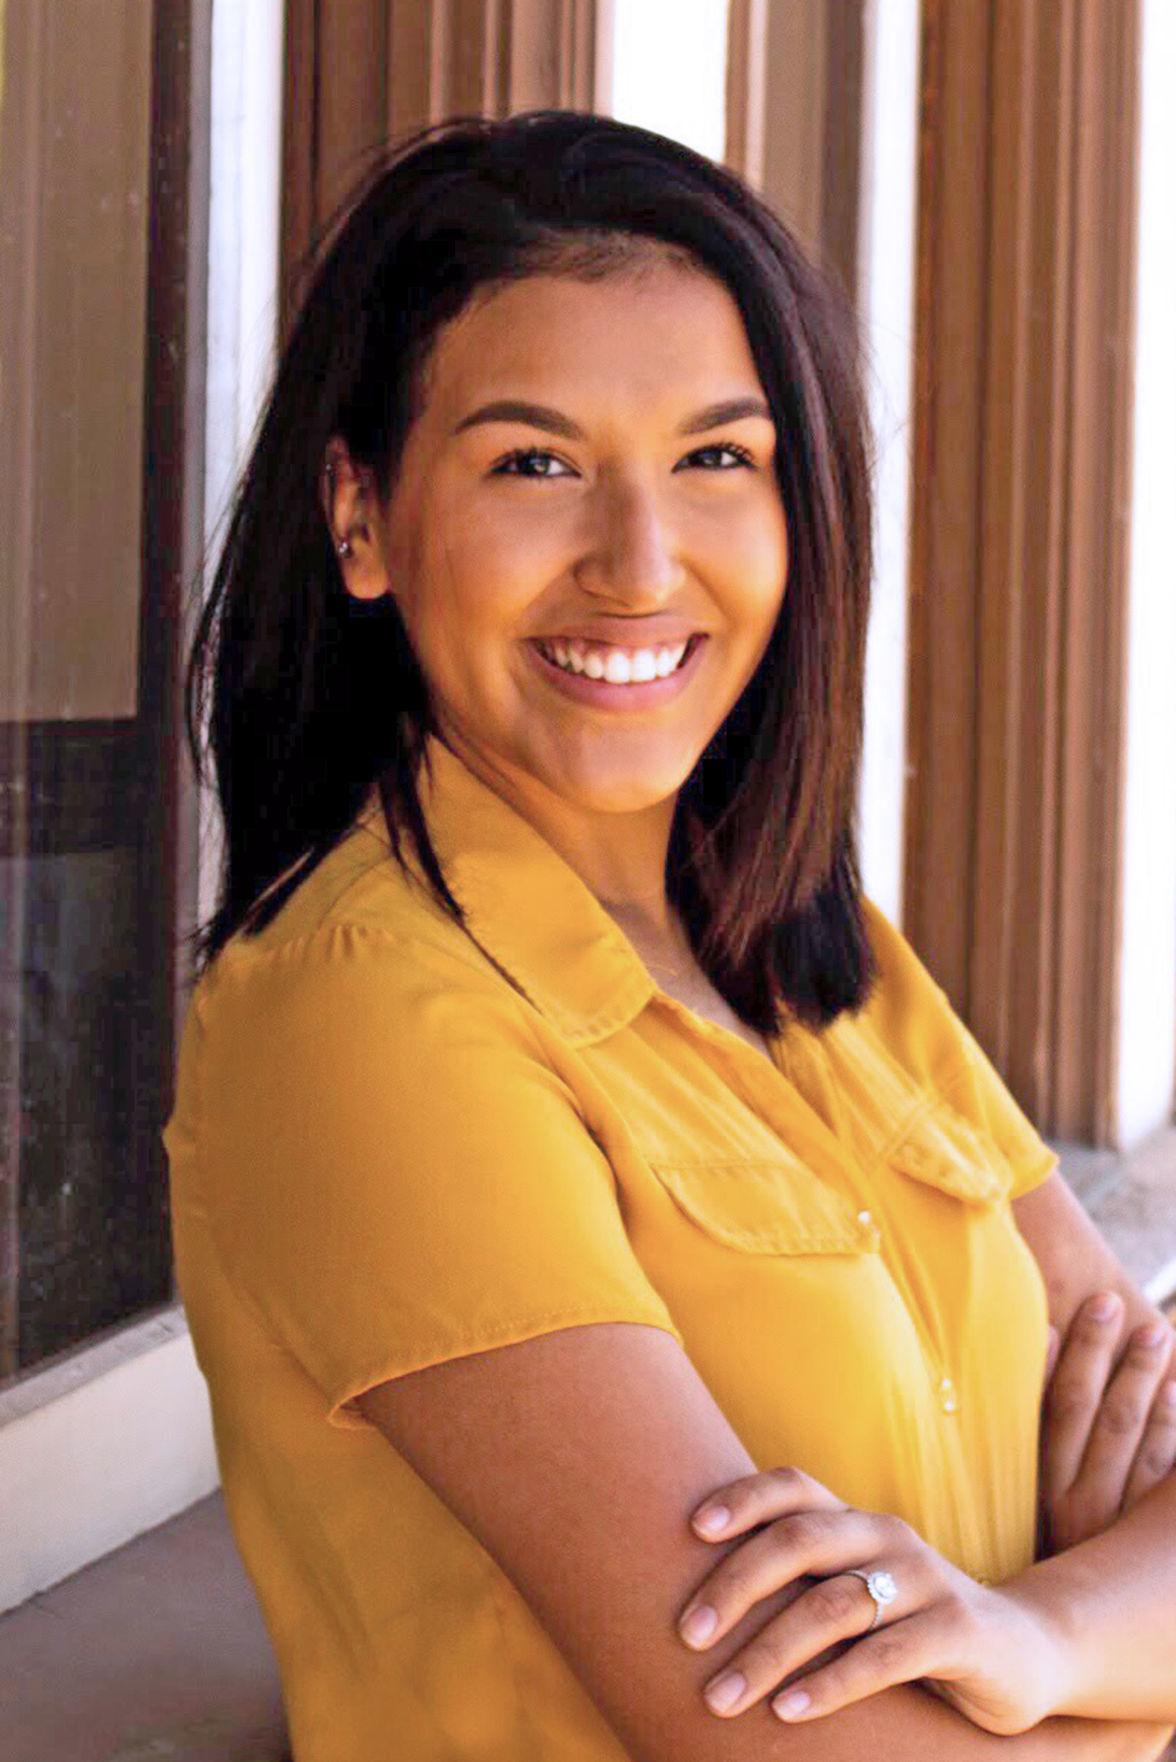 Elections: Jewel Hurtado